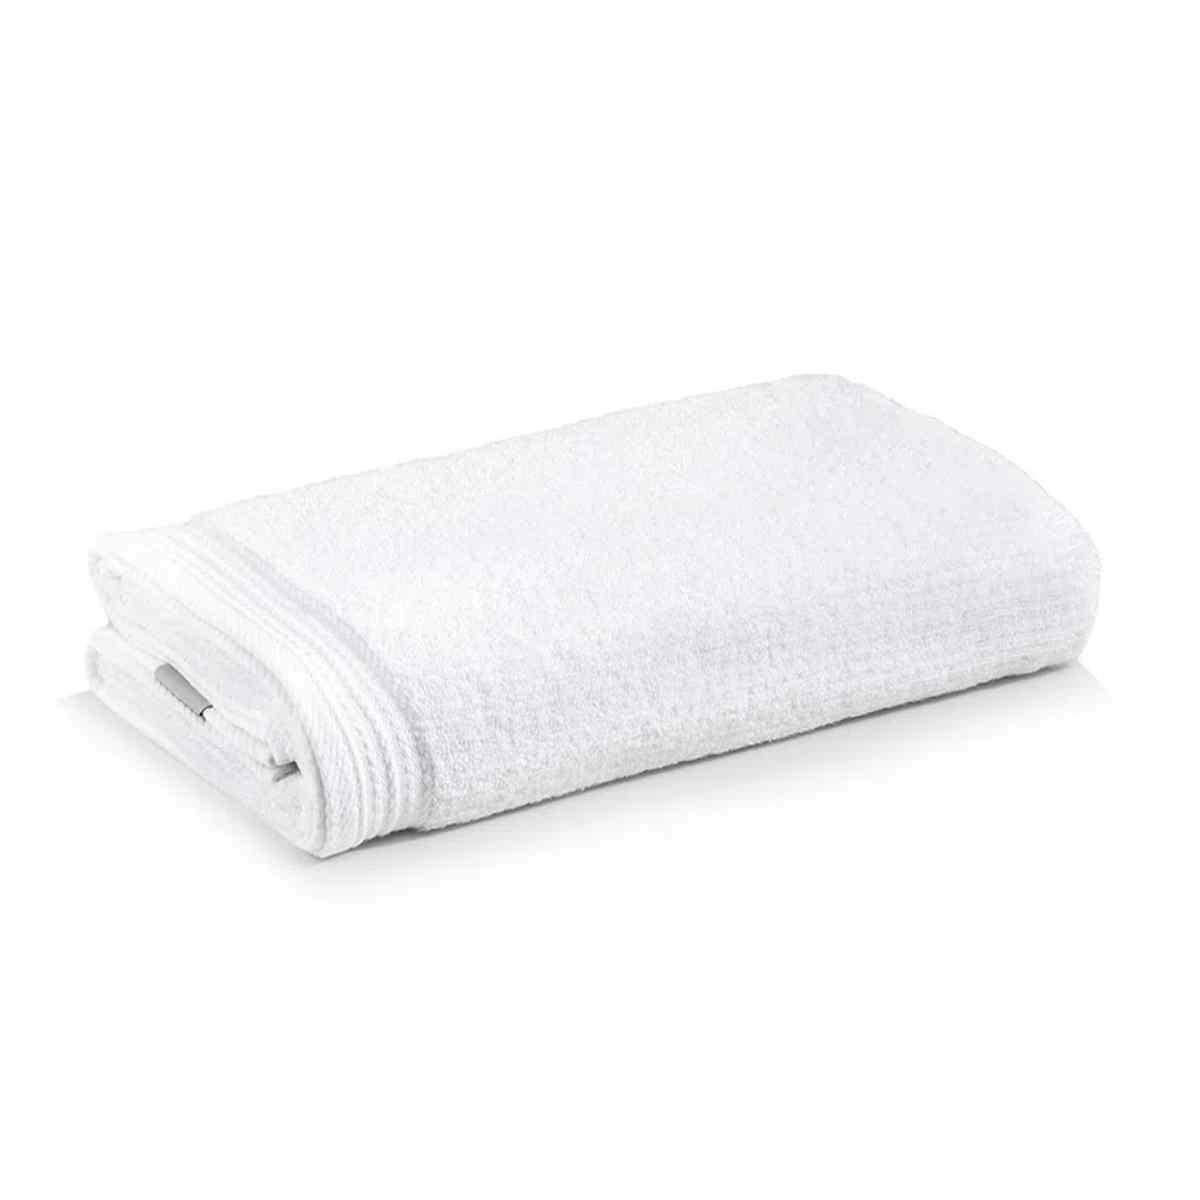 Toalha banho imperial 70x140 Branco